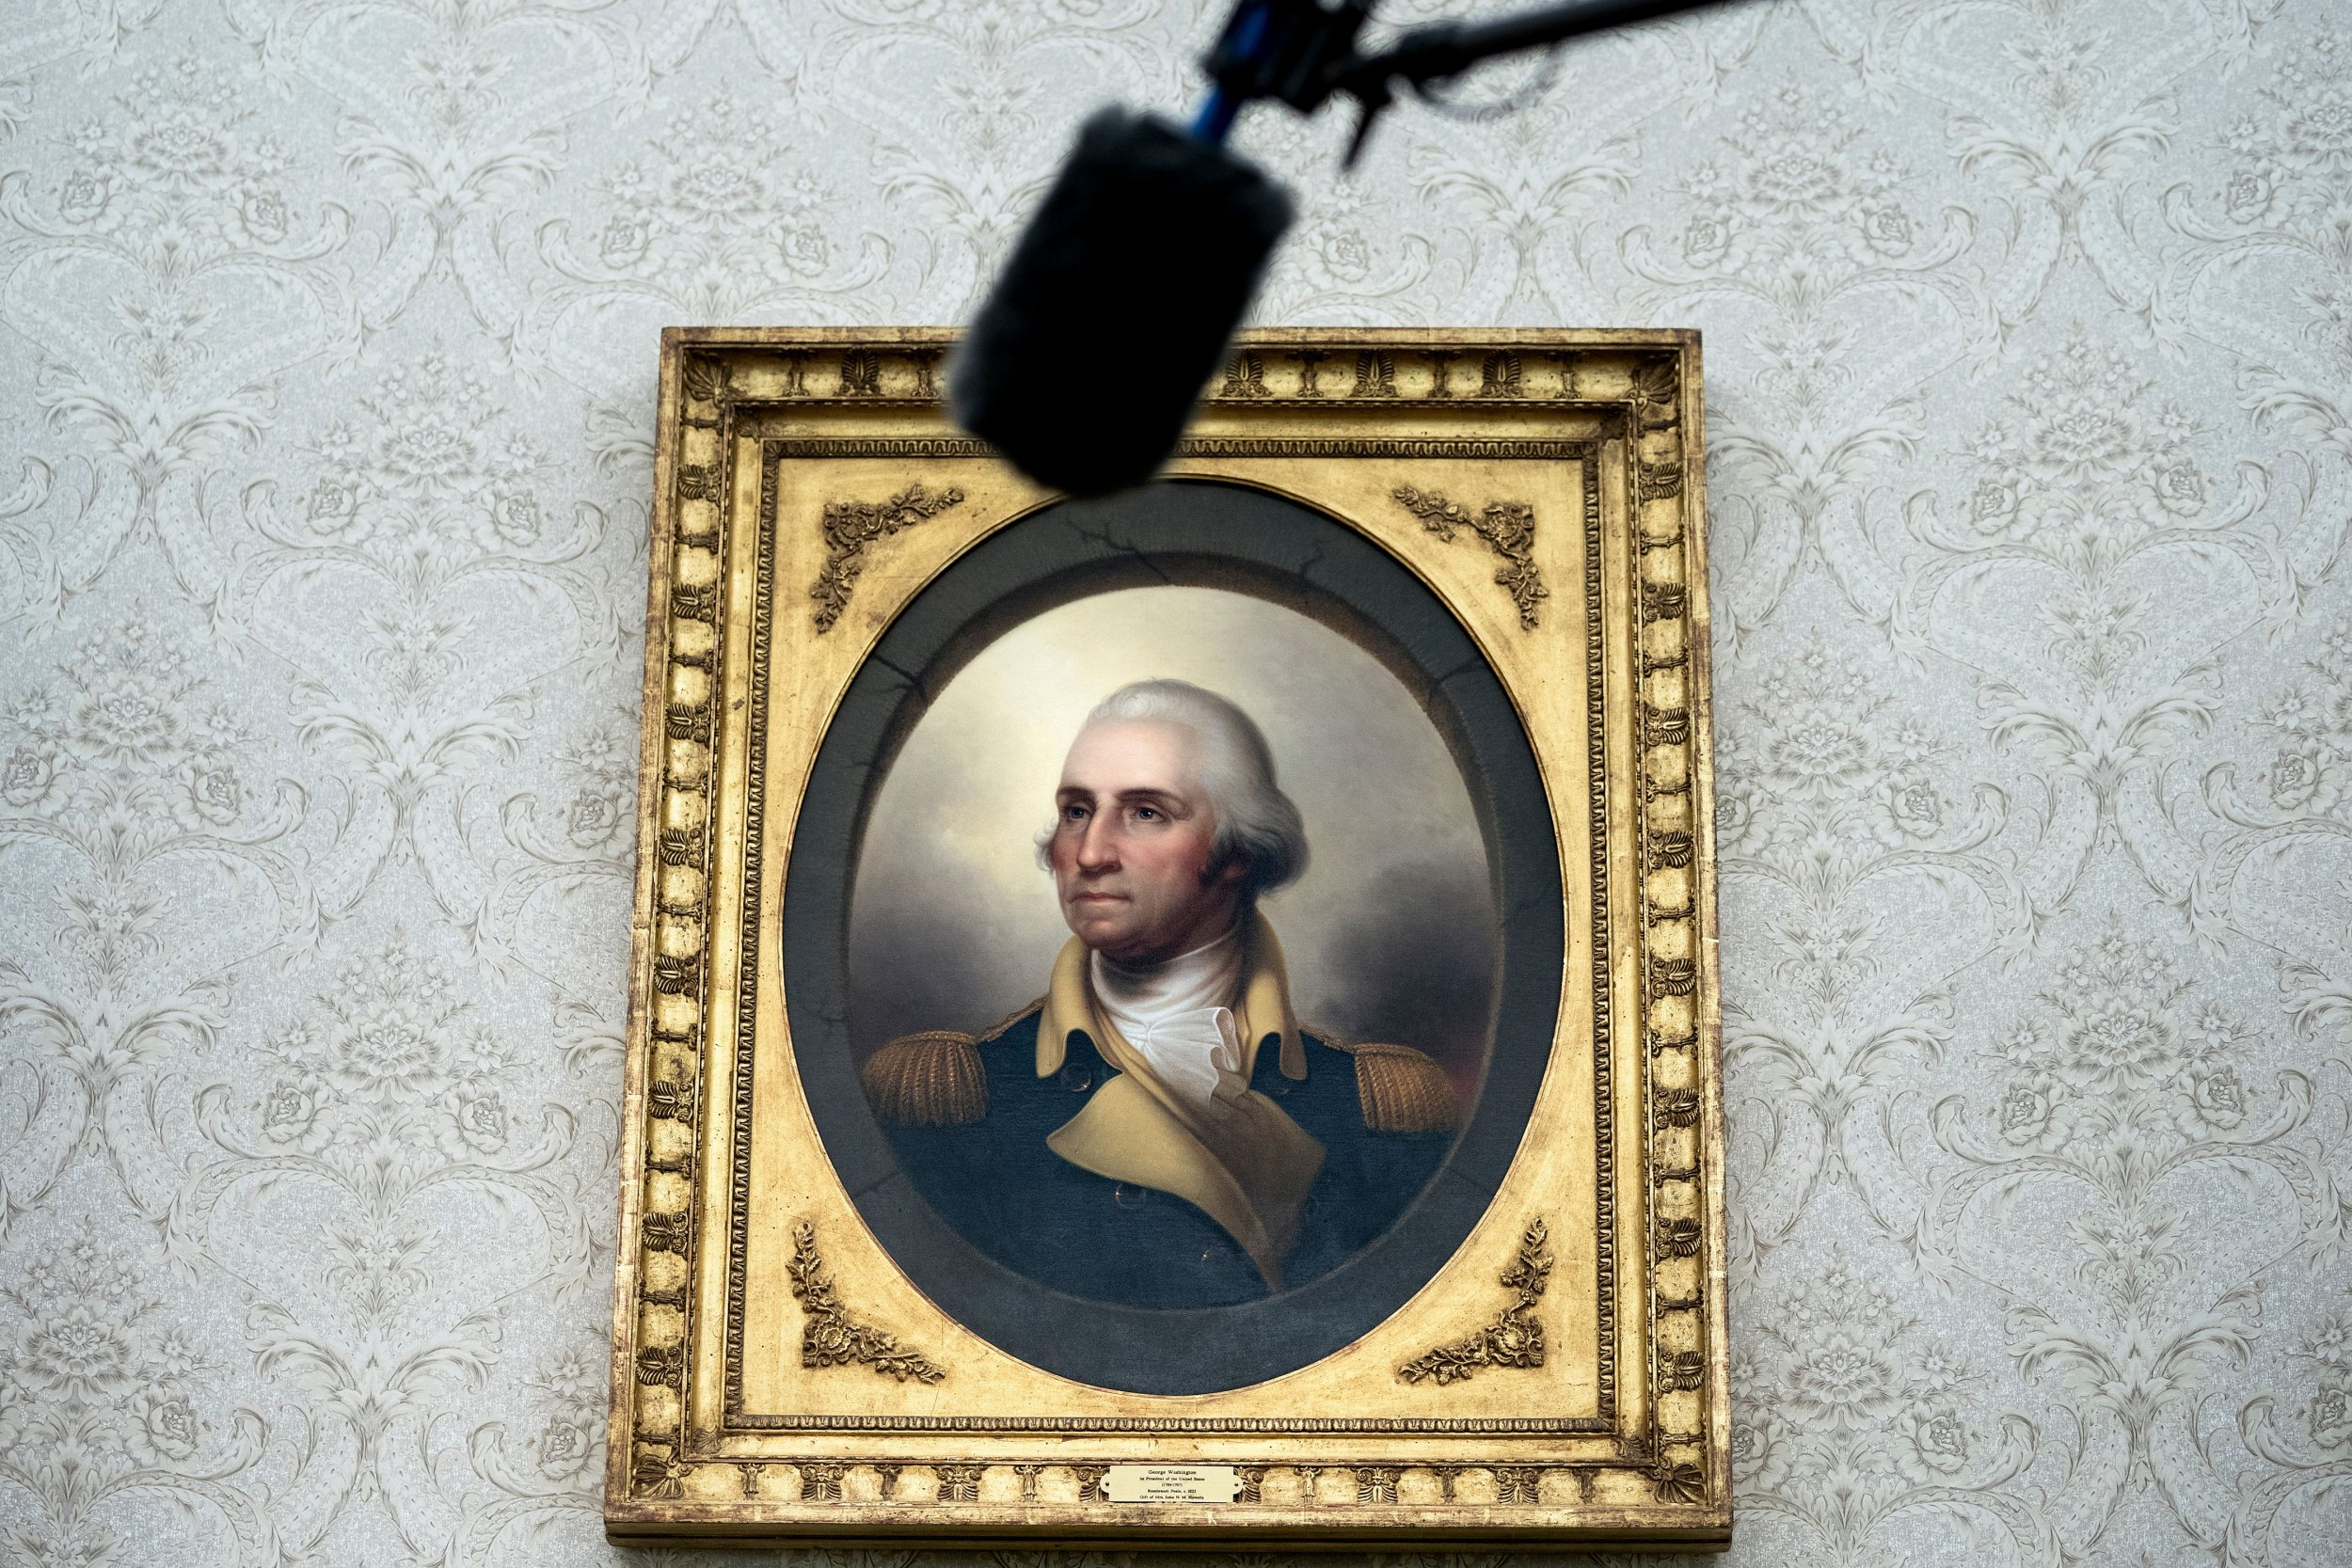 Presidents Day 2019 George Washington Quotes To Celebrate His Birthday